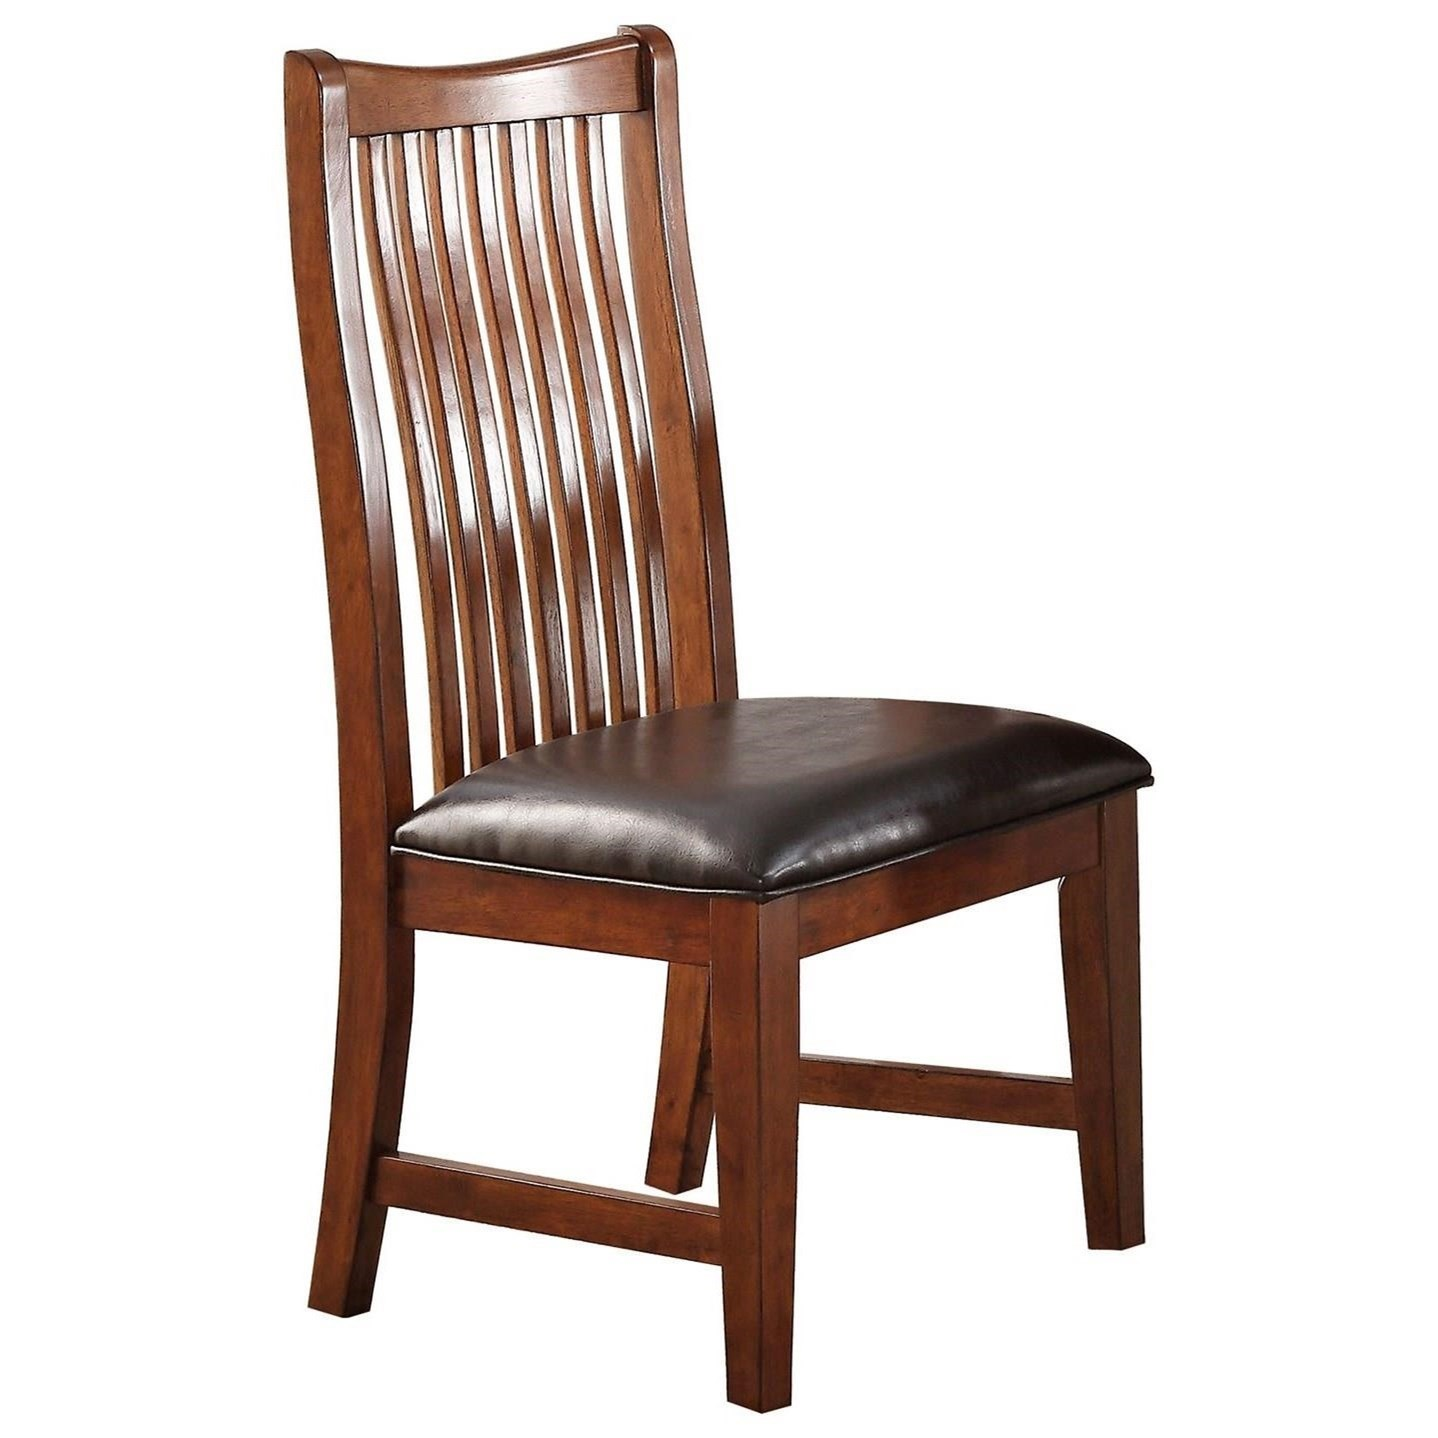 Raised Slat Back Side Chair